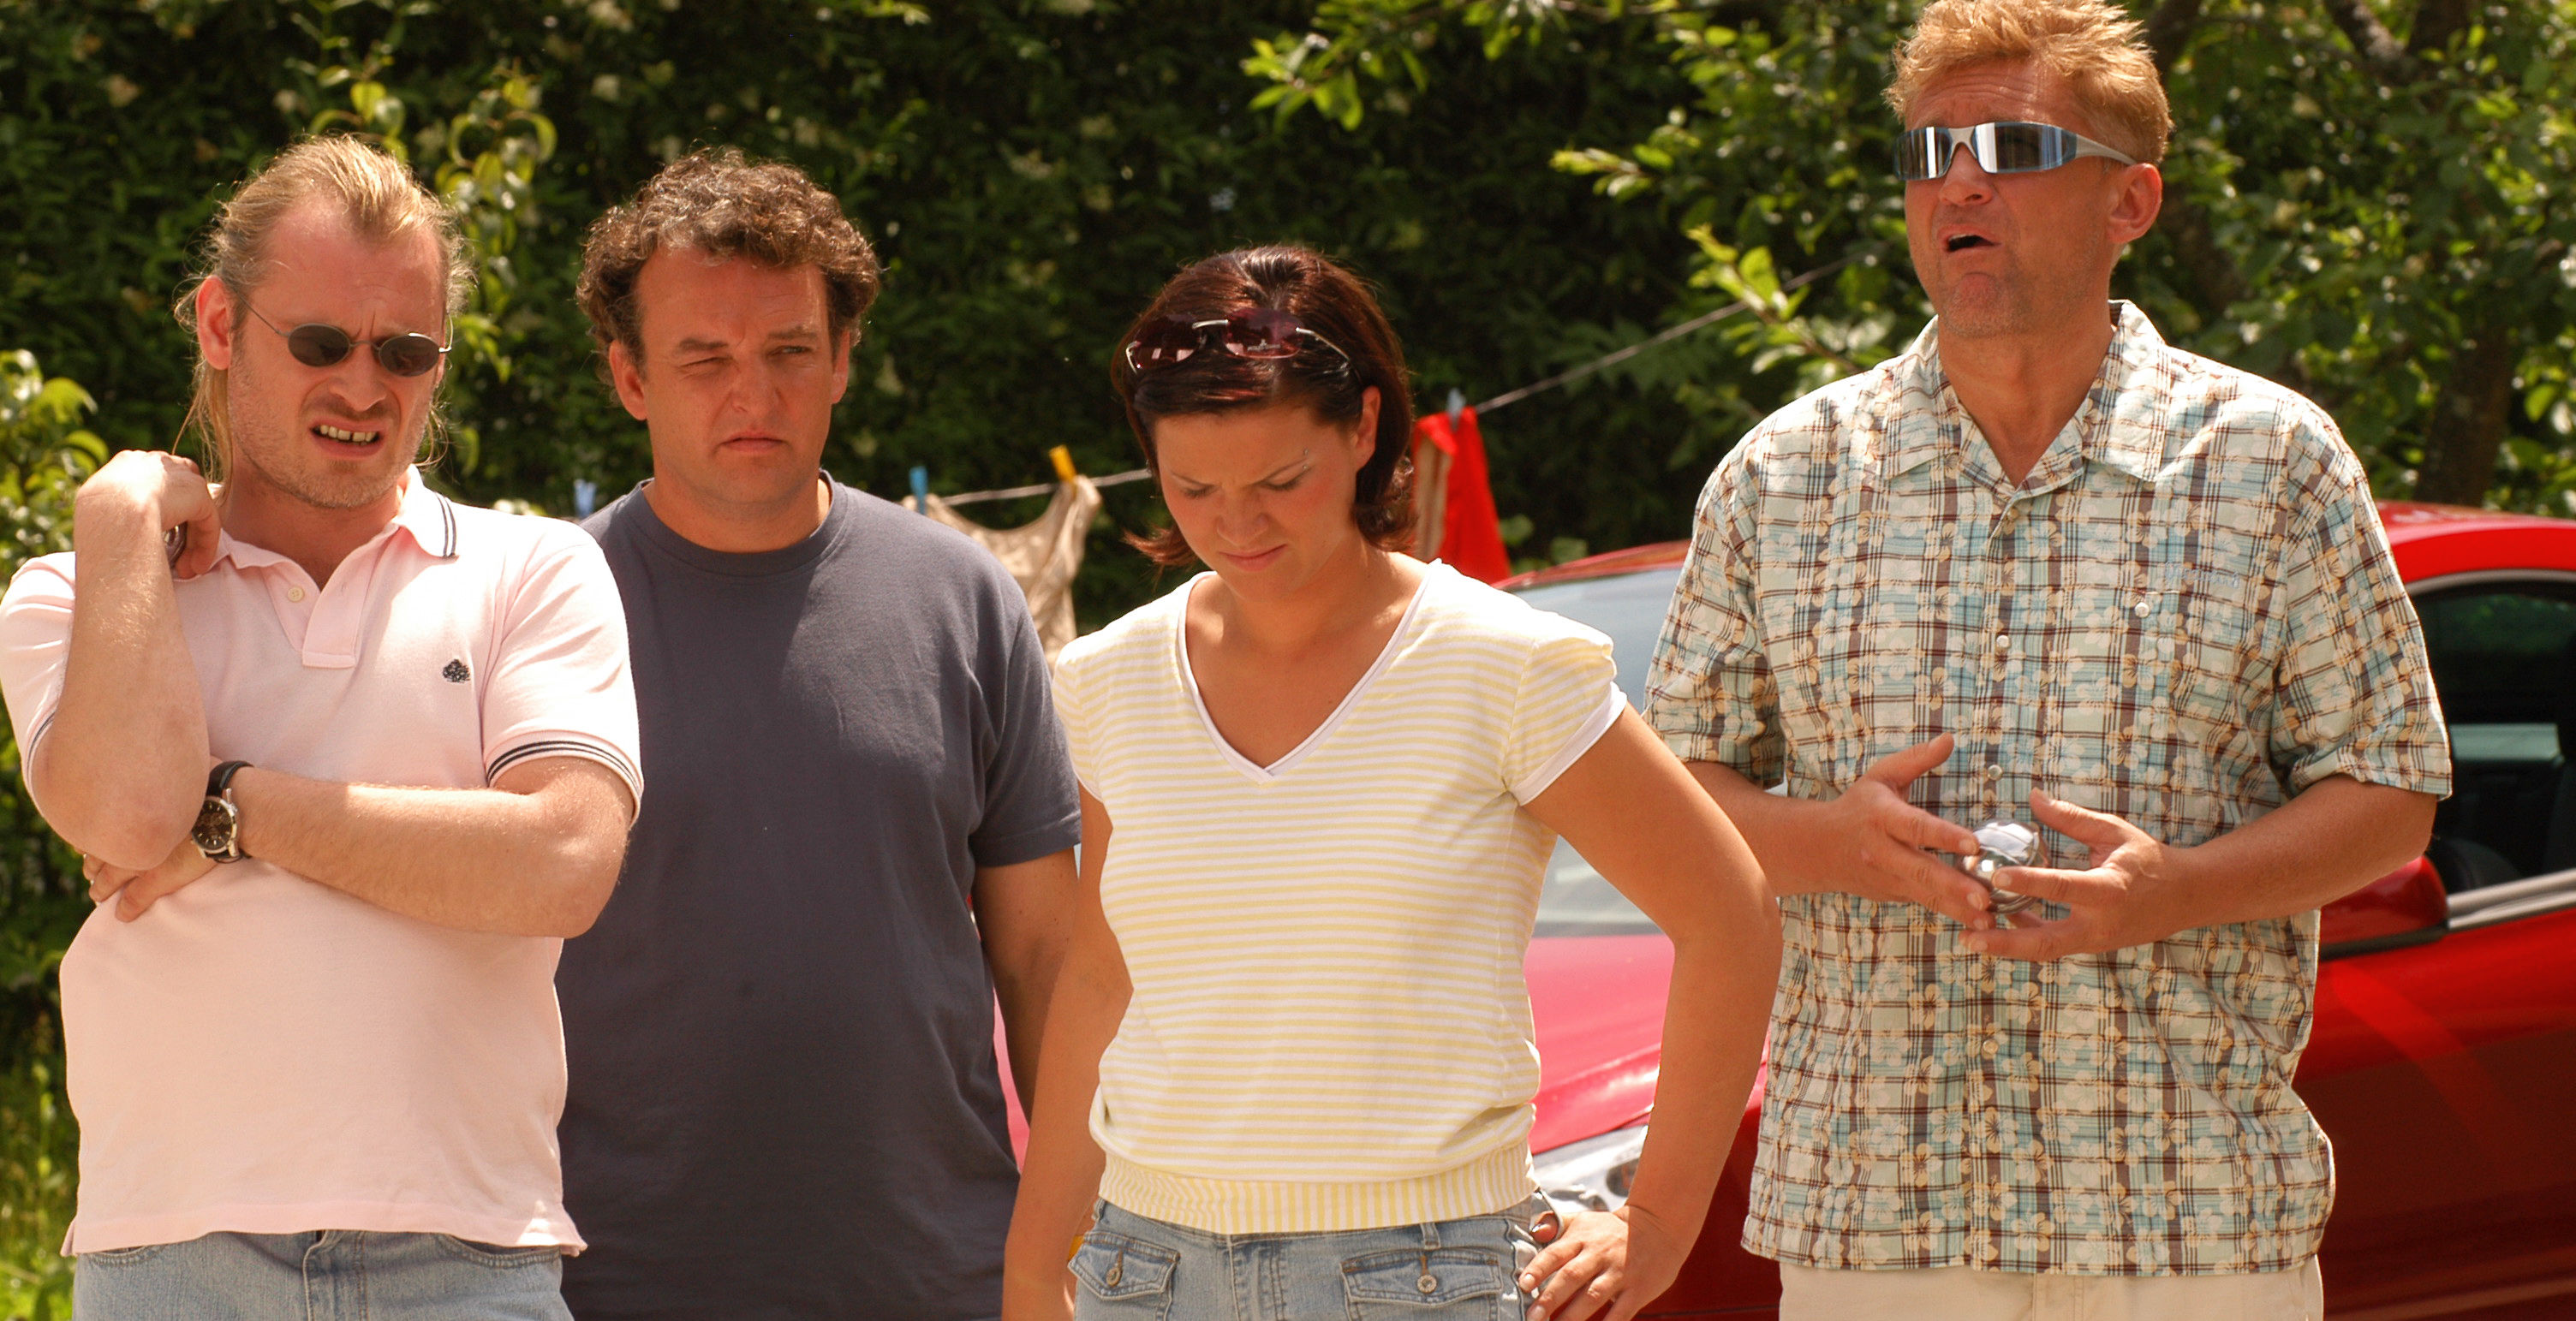 Rene (Johannes Krisch), Freddy (Marco Rima), Shark (Magdalena Rentenberger), Larry (Rainhard Fendrich)